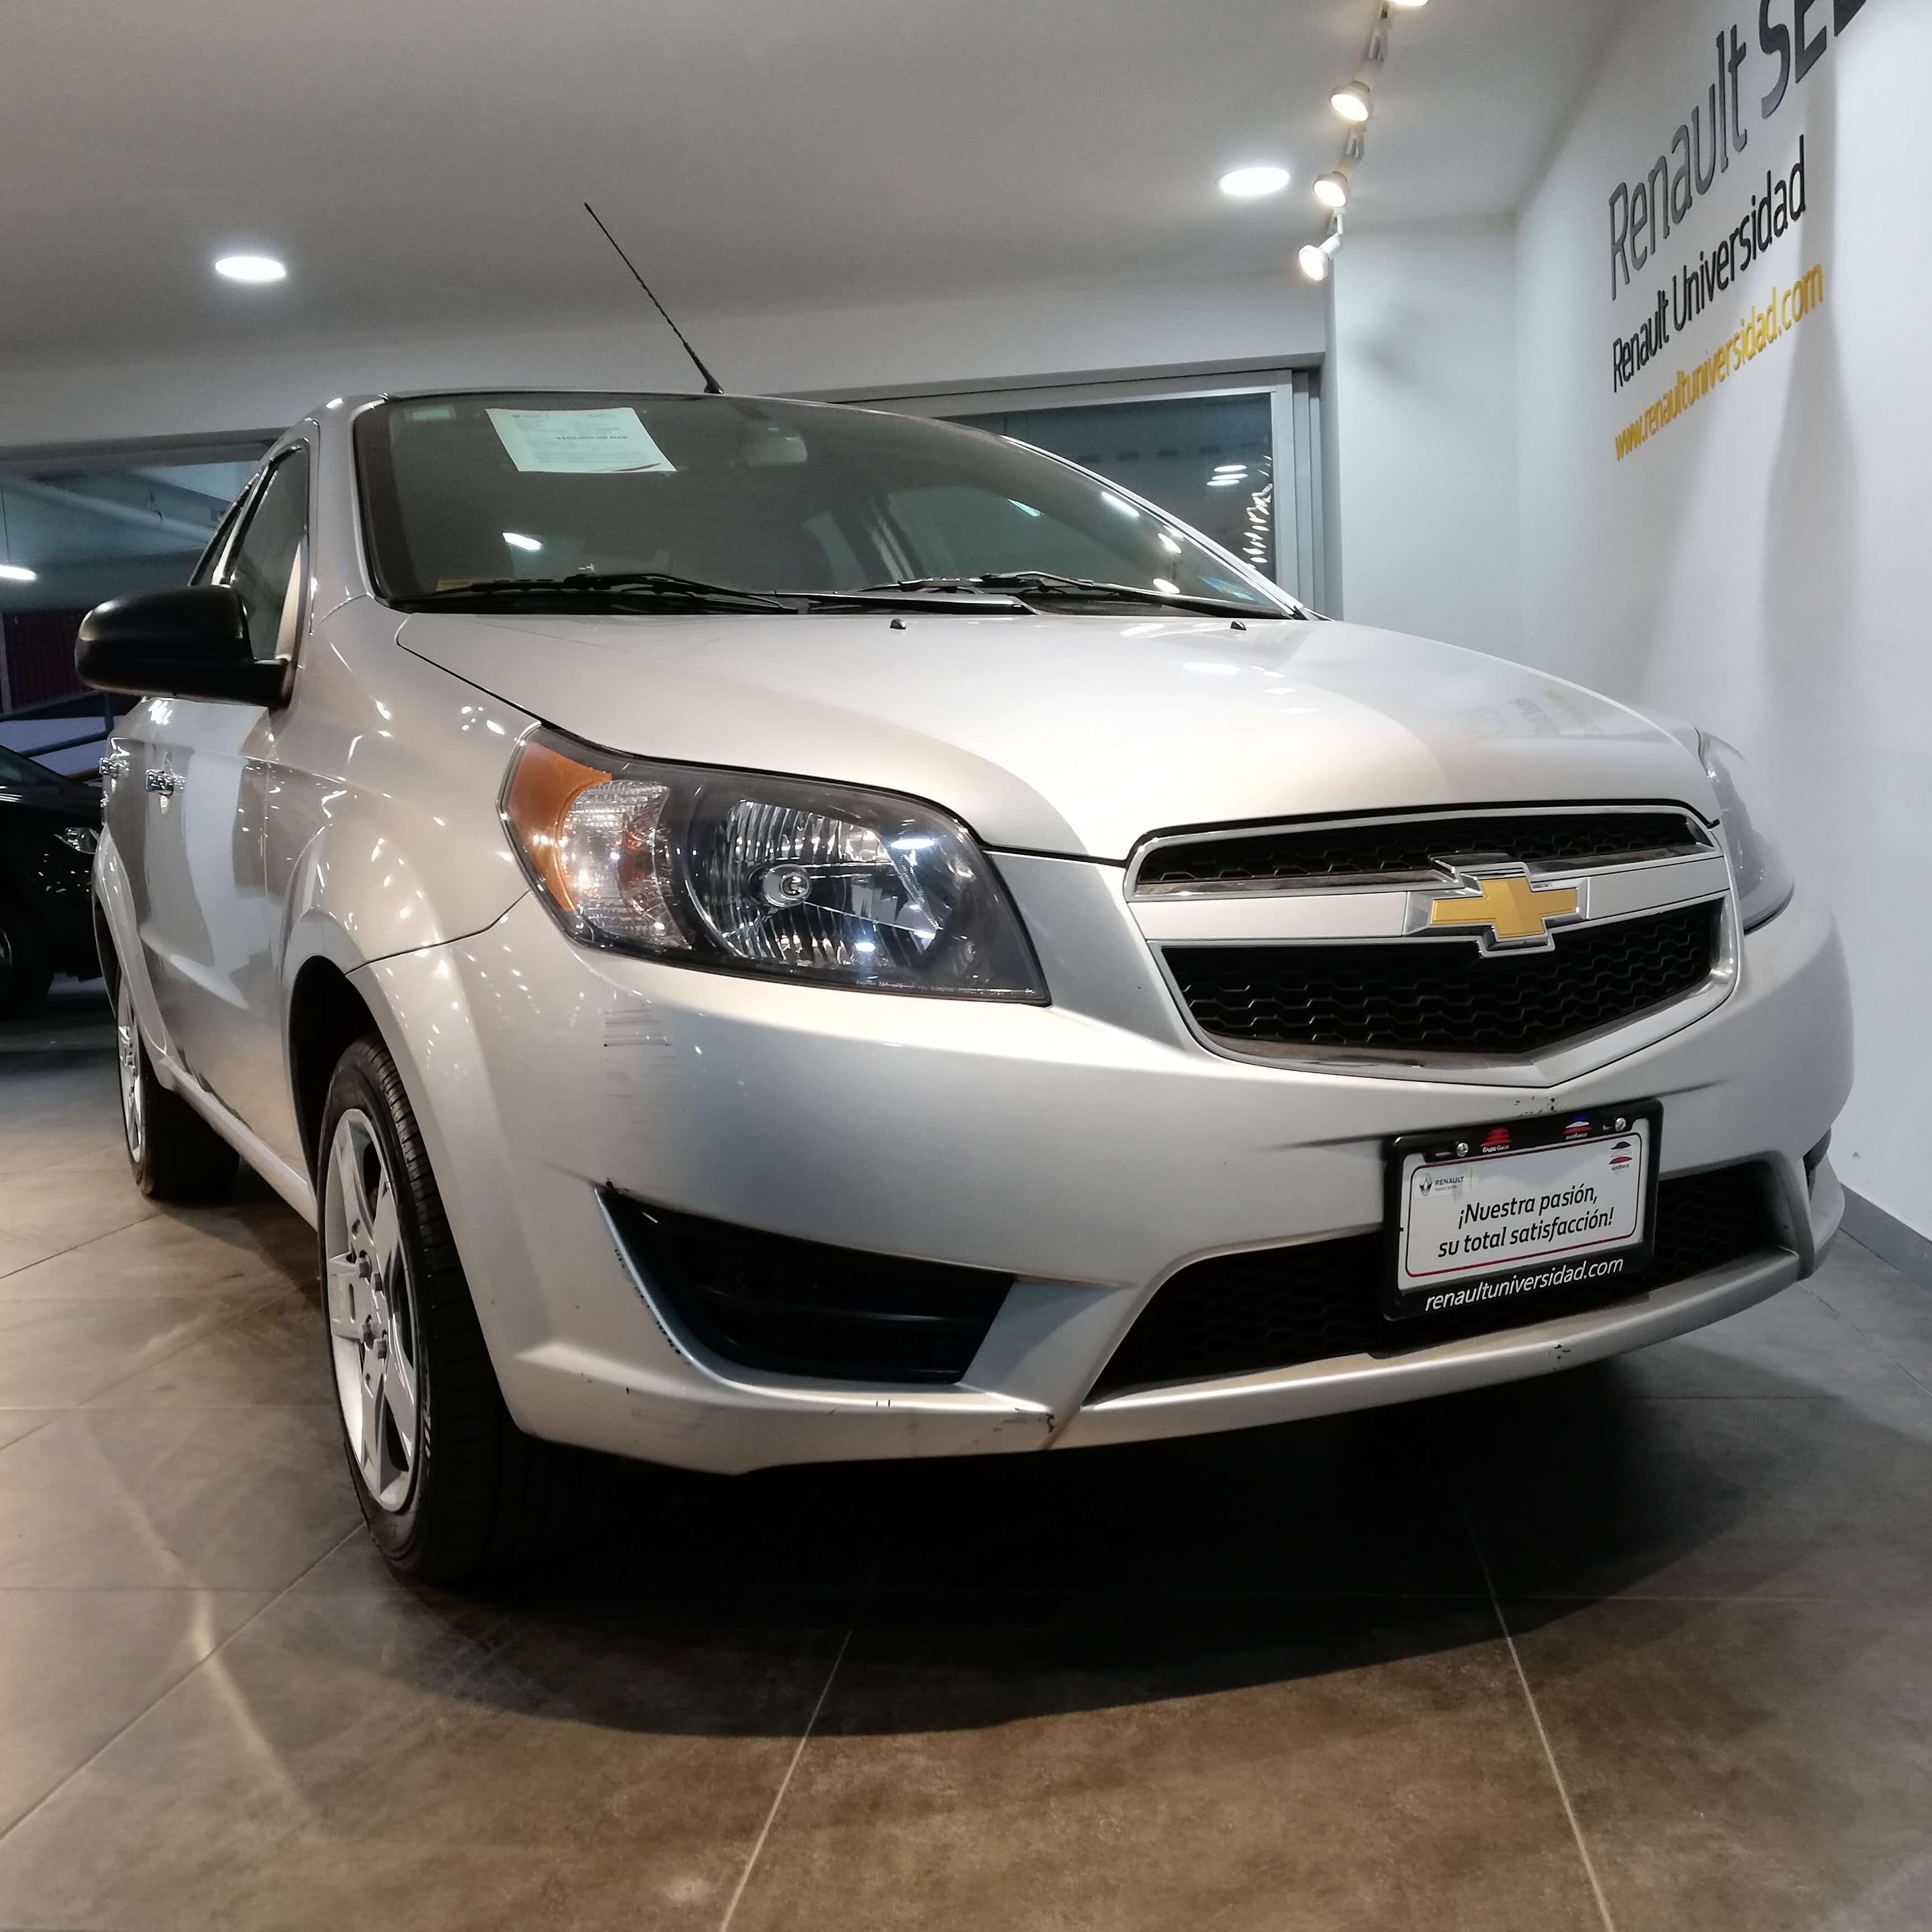 Chevrolet Aveo PAQ W - GocarCredit